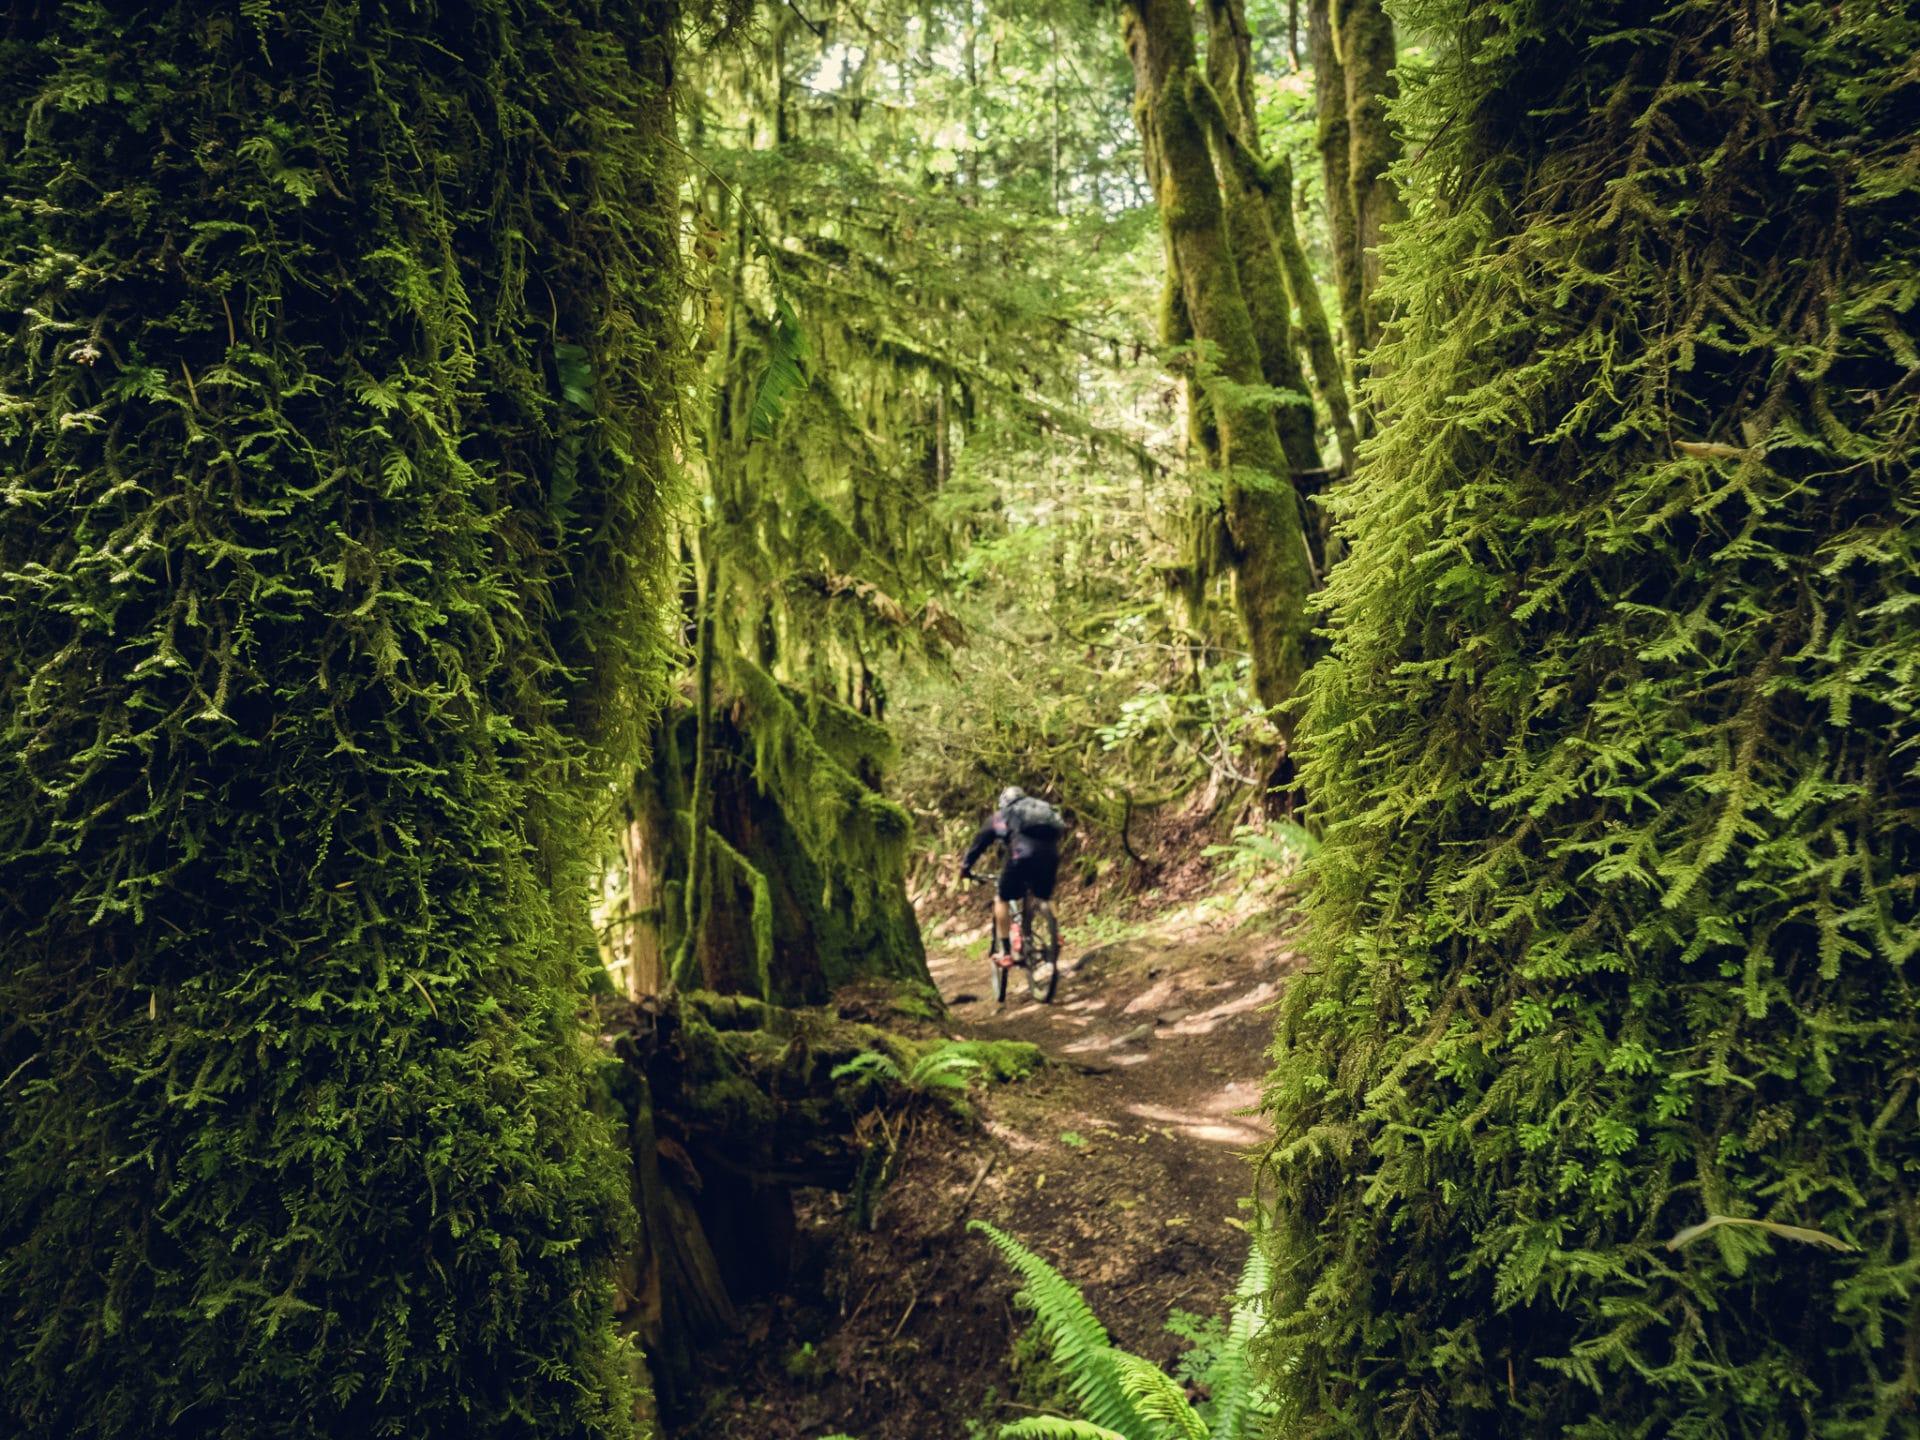 Squamish-Alice-Lake-Crouching-Squirrel-Hidden-Monkey